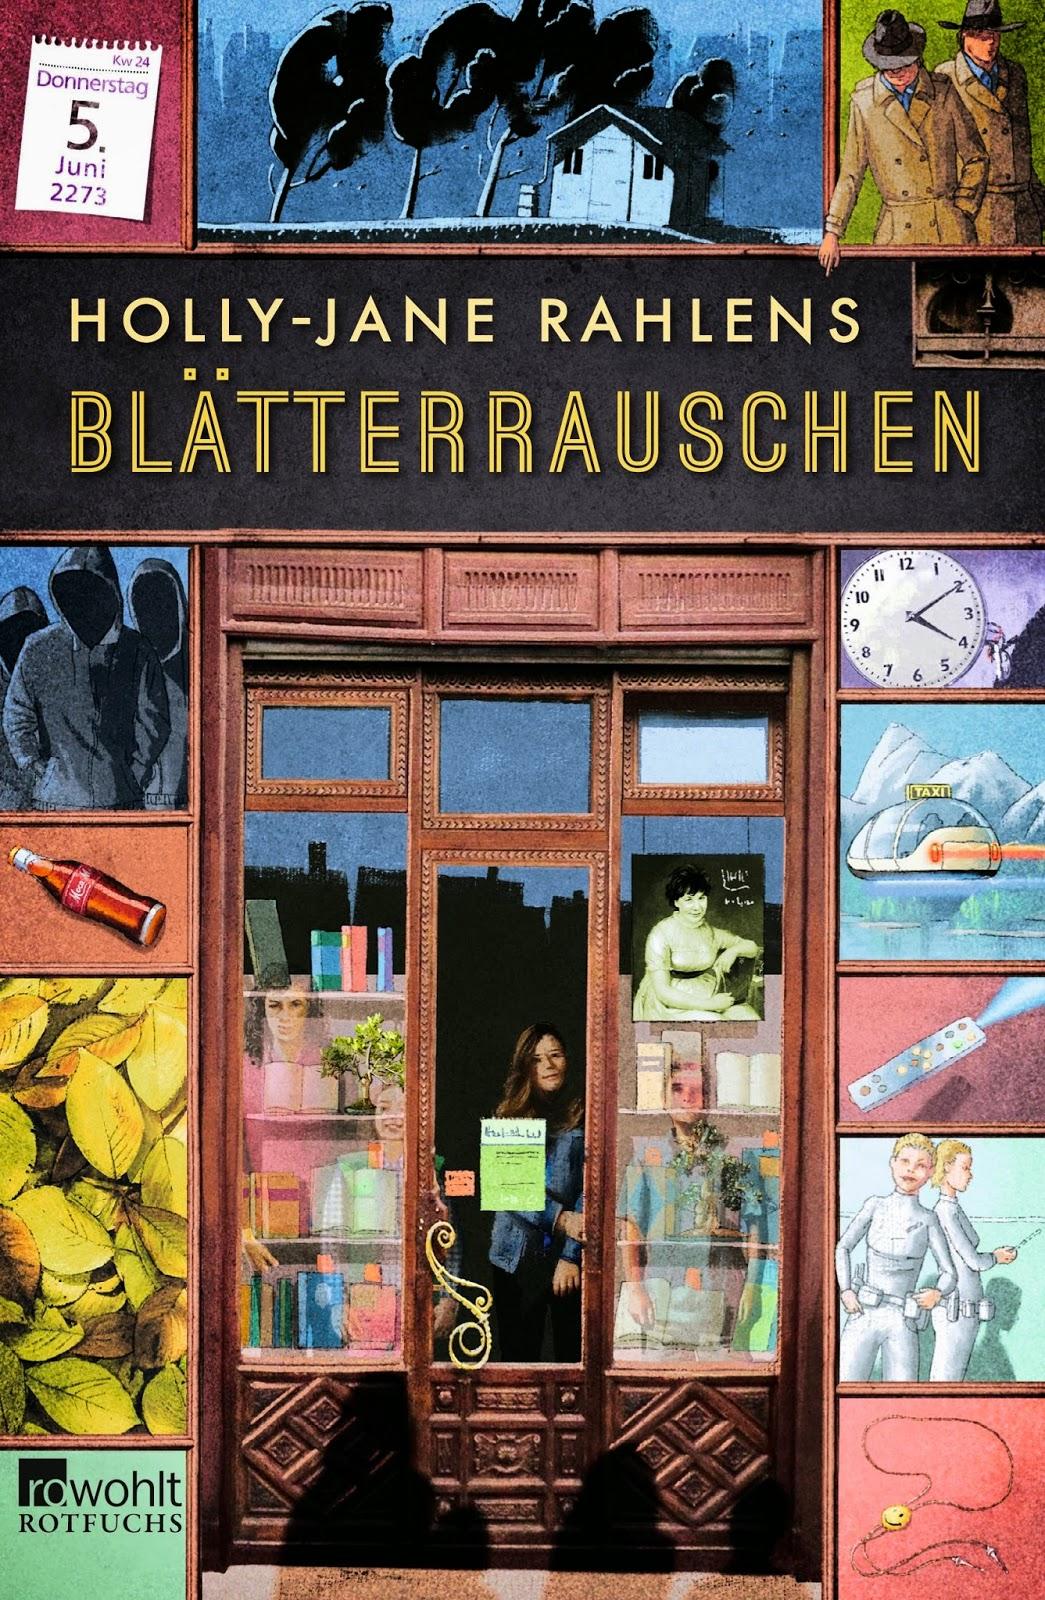 http://www.amazon.de/Bl%C3%A4tterrauschen-Holly-Jane-Rahlens/dp/3499216868/ref=sr_1_1_twi_2?ie=UTF8&qid=1423922181&sr=8-1&keywords=bl%C3%A4tterrauschen